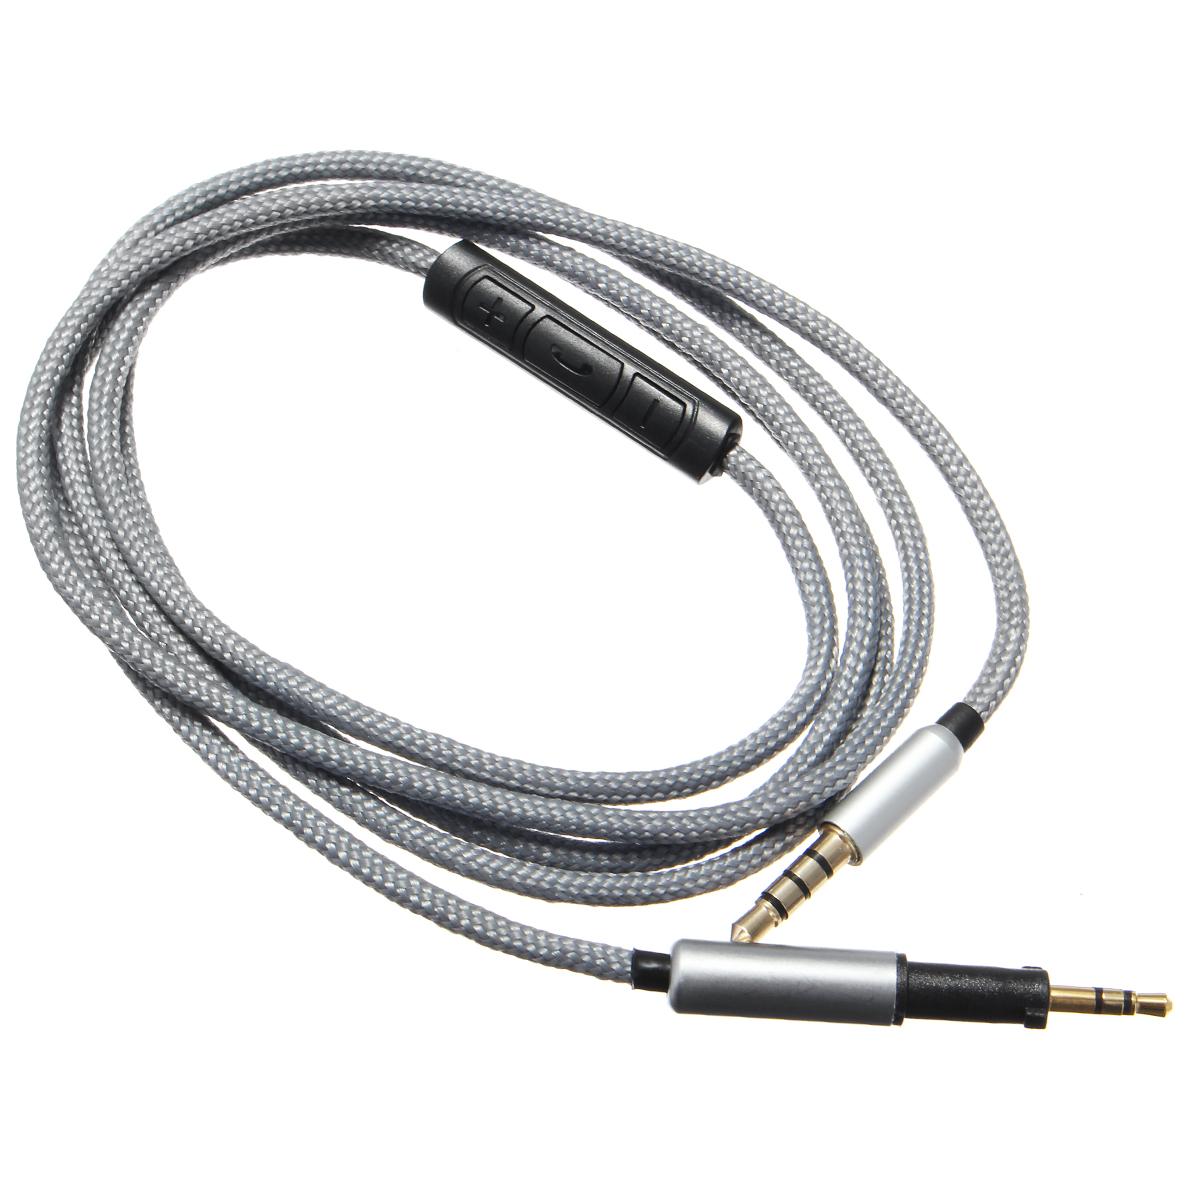 1.2M Audiokabel Kopfhörerkabel Klinke 3,5mm auf 2.5mm mit Mikrofon ...